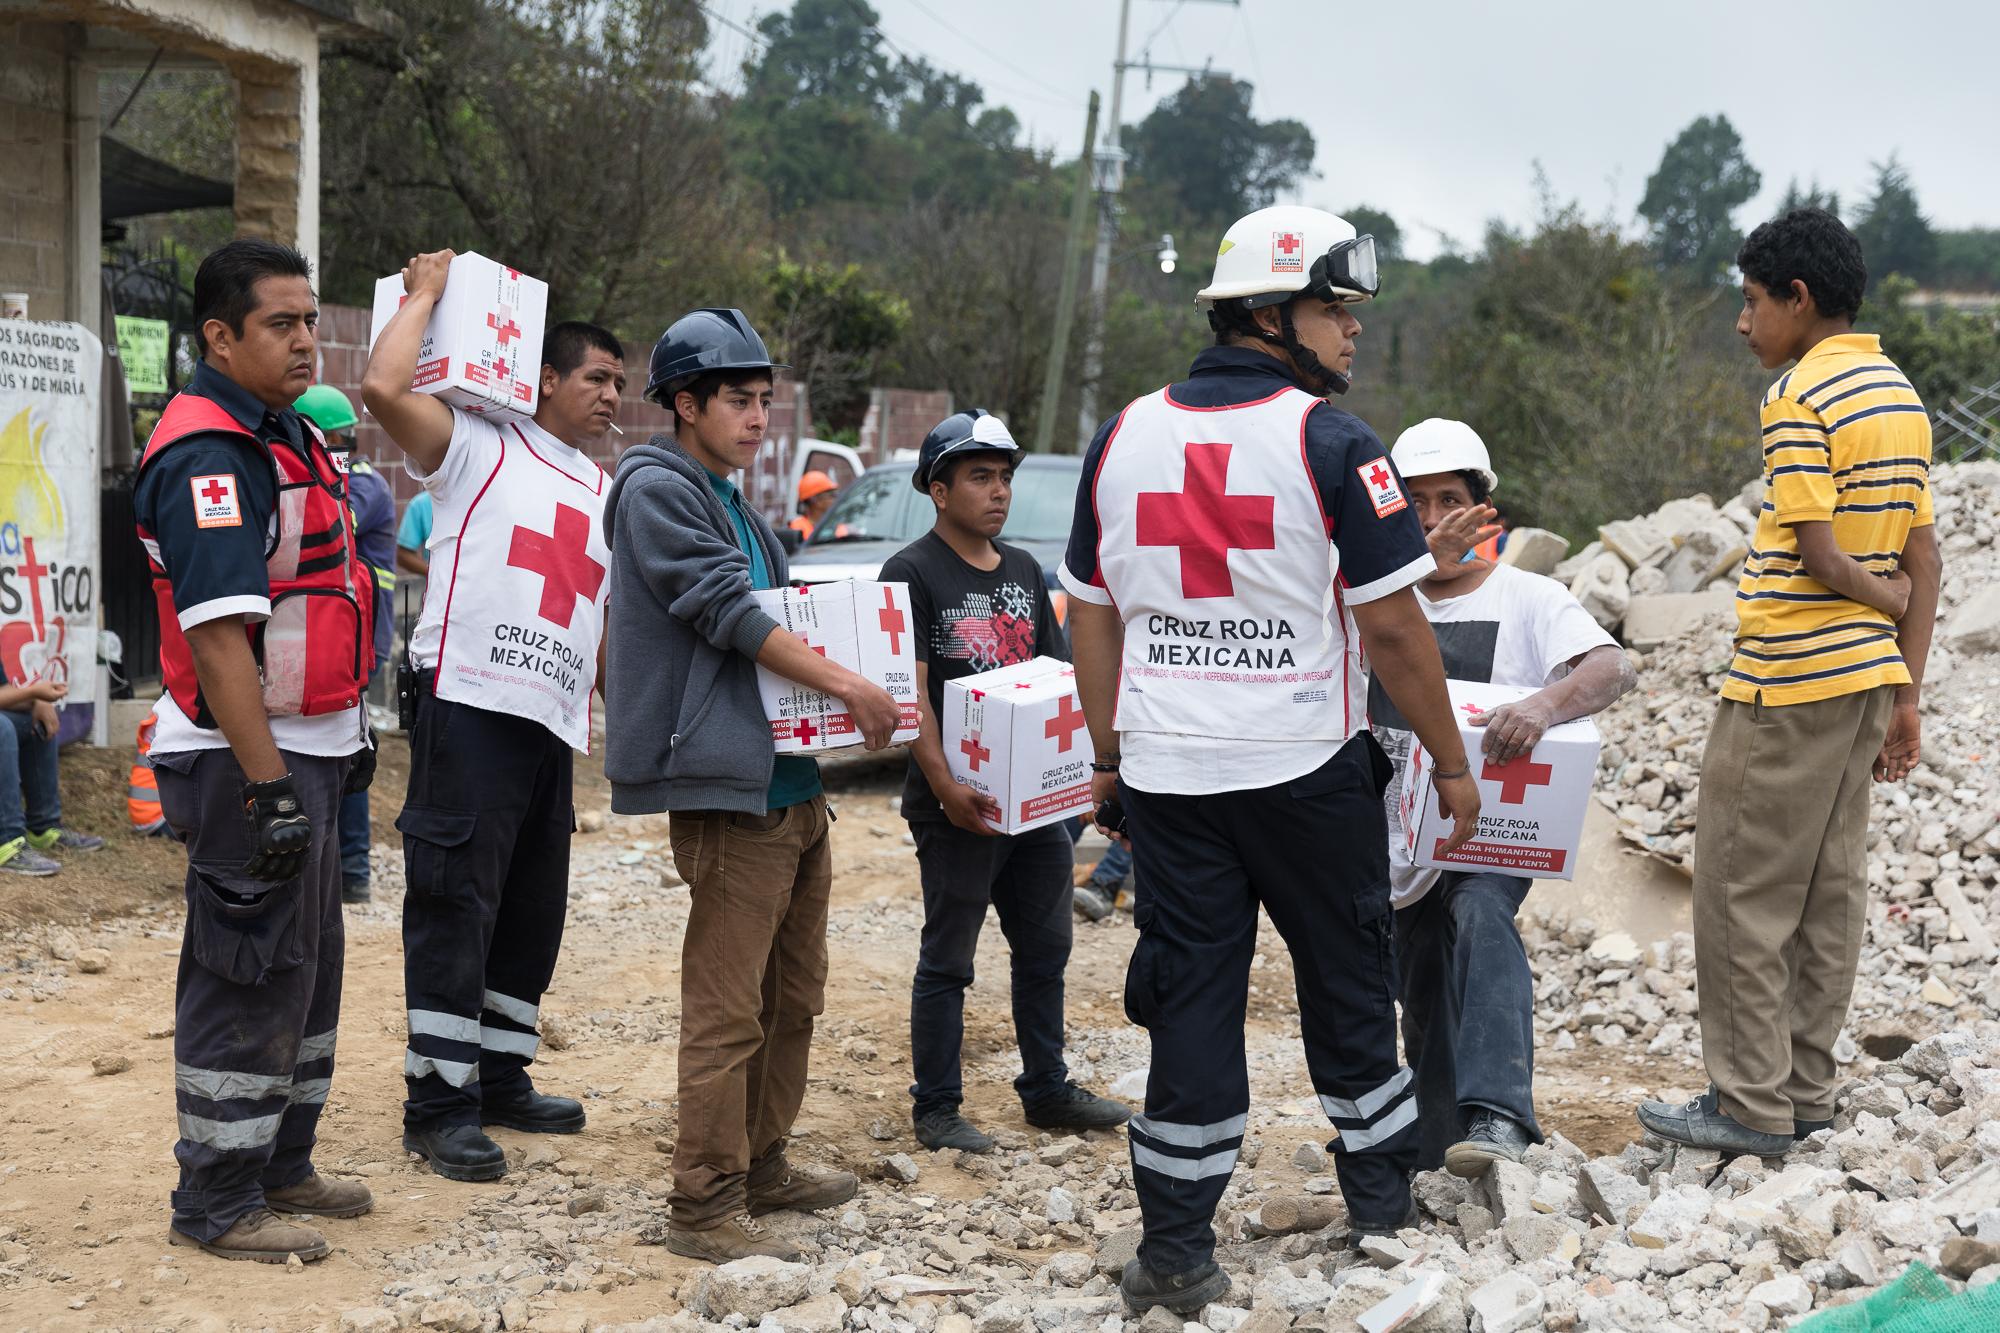 Red Cross brigades and volunteers deliver provisions to impacted households in Hueyapan Morelos.PHOTO: Francisco Alcala Torreslanda